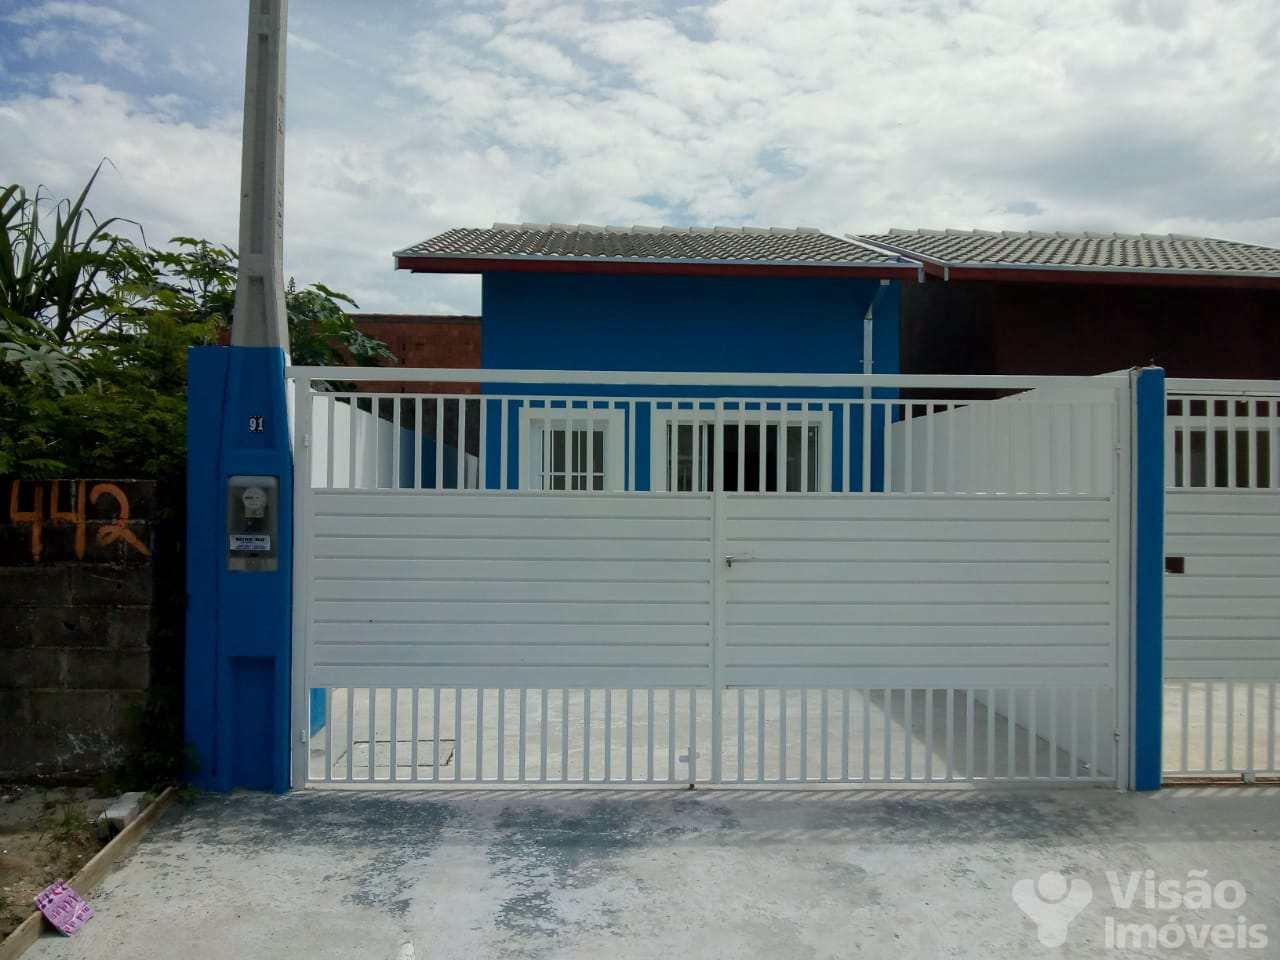 Casa com 2 dorms, Residencial Pasin, Pindamonhangaba - R$ 165 mil, Cod: 1920135